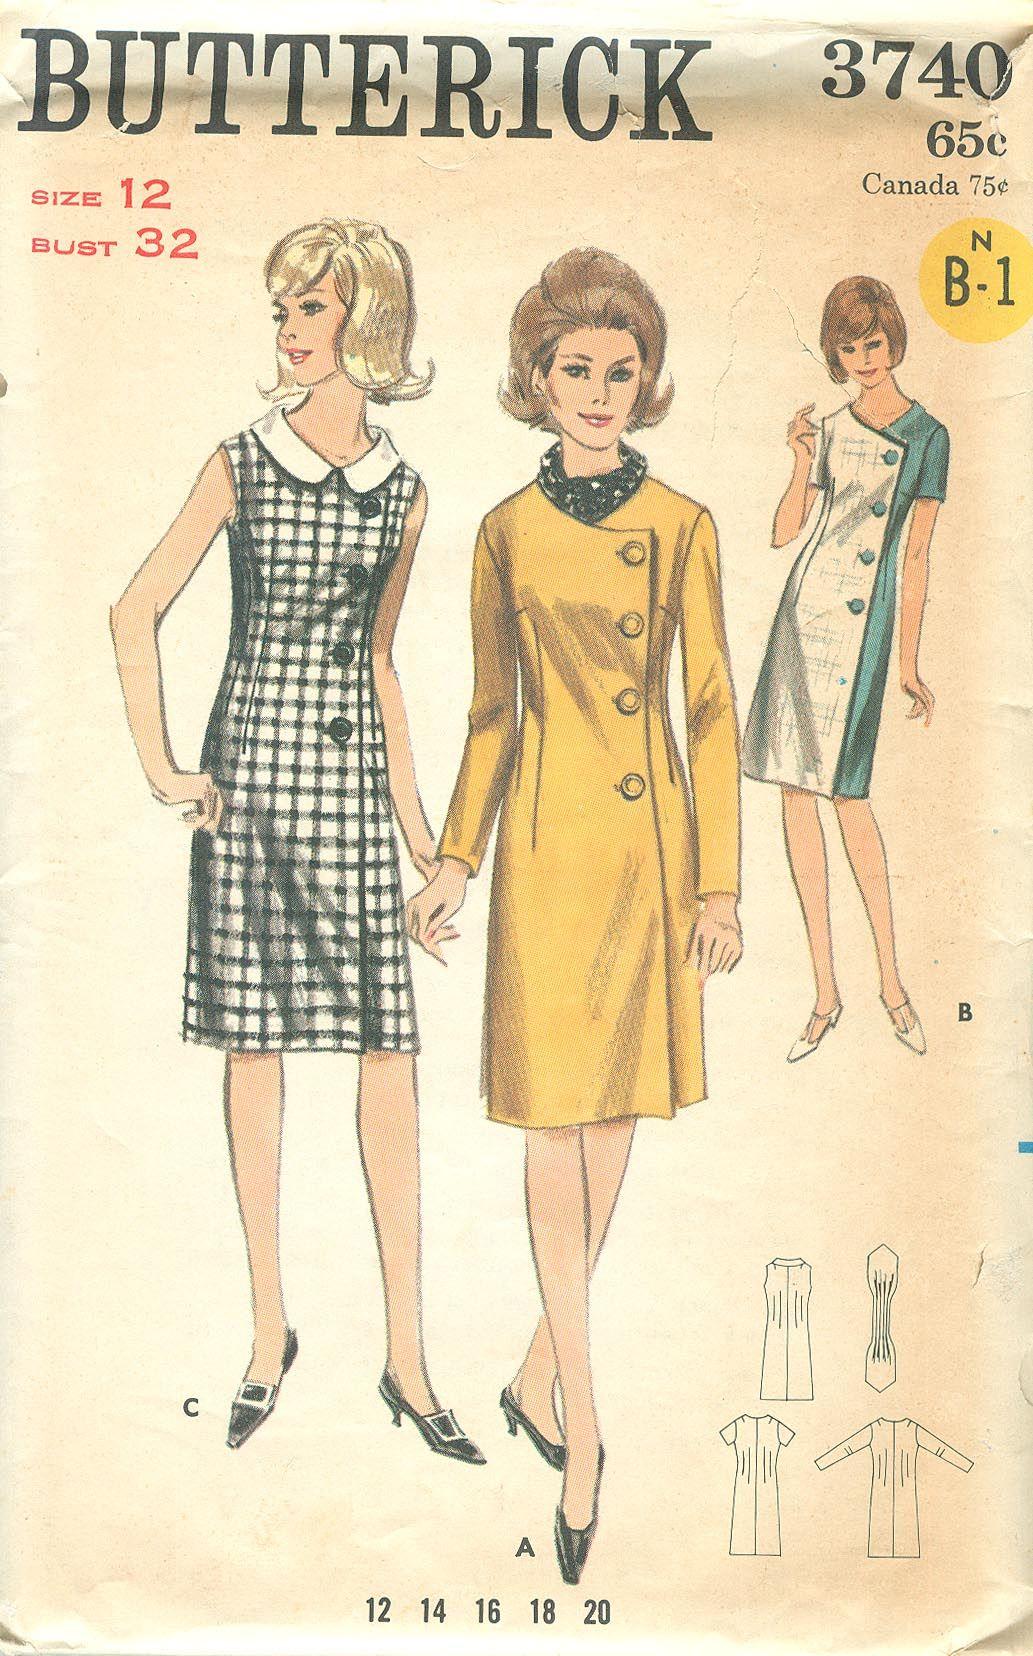 dating vintage butterick patterns